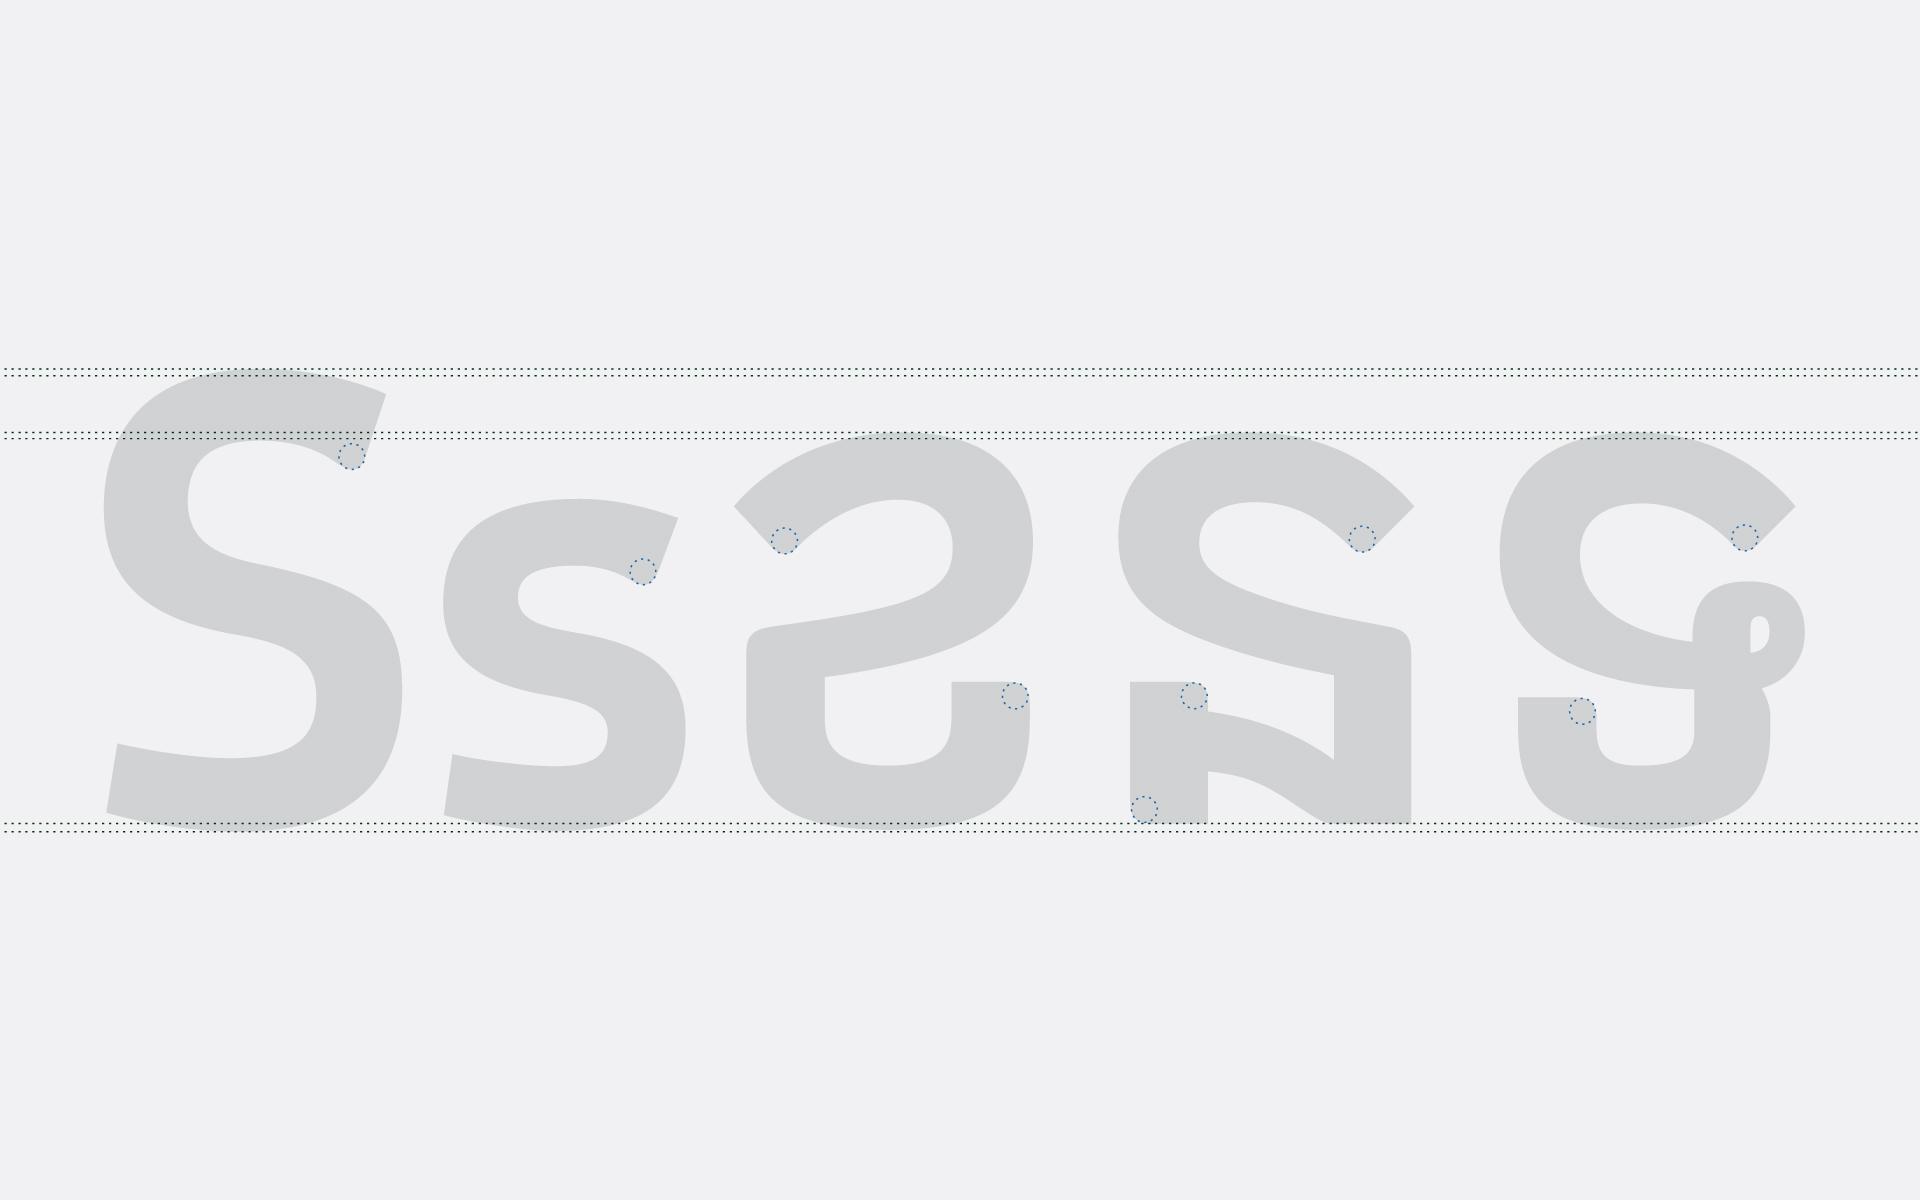 Carlsberg-Sans-Type-Design-11